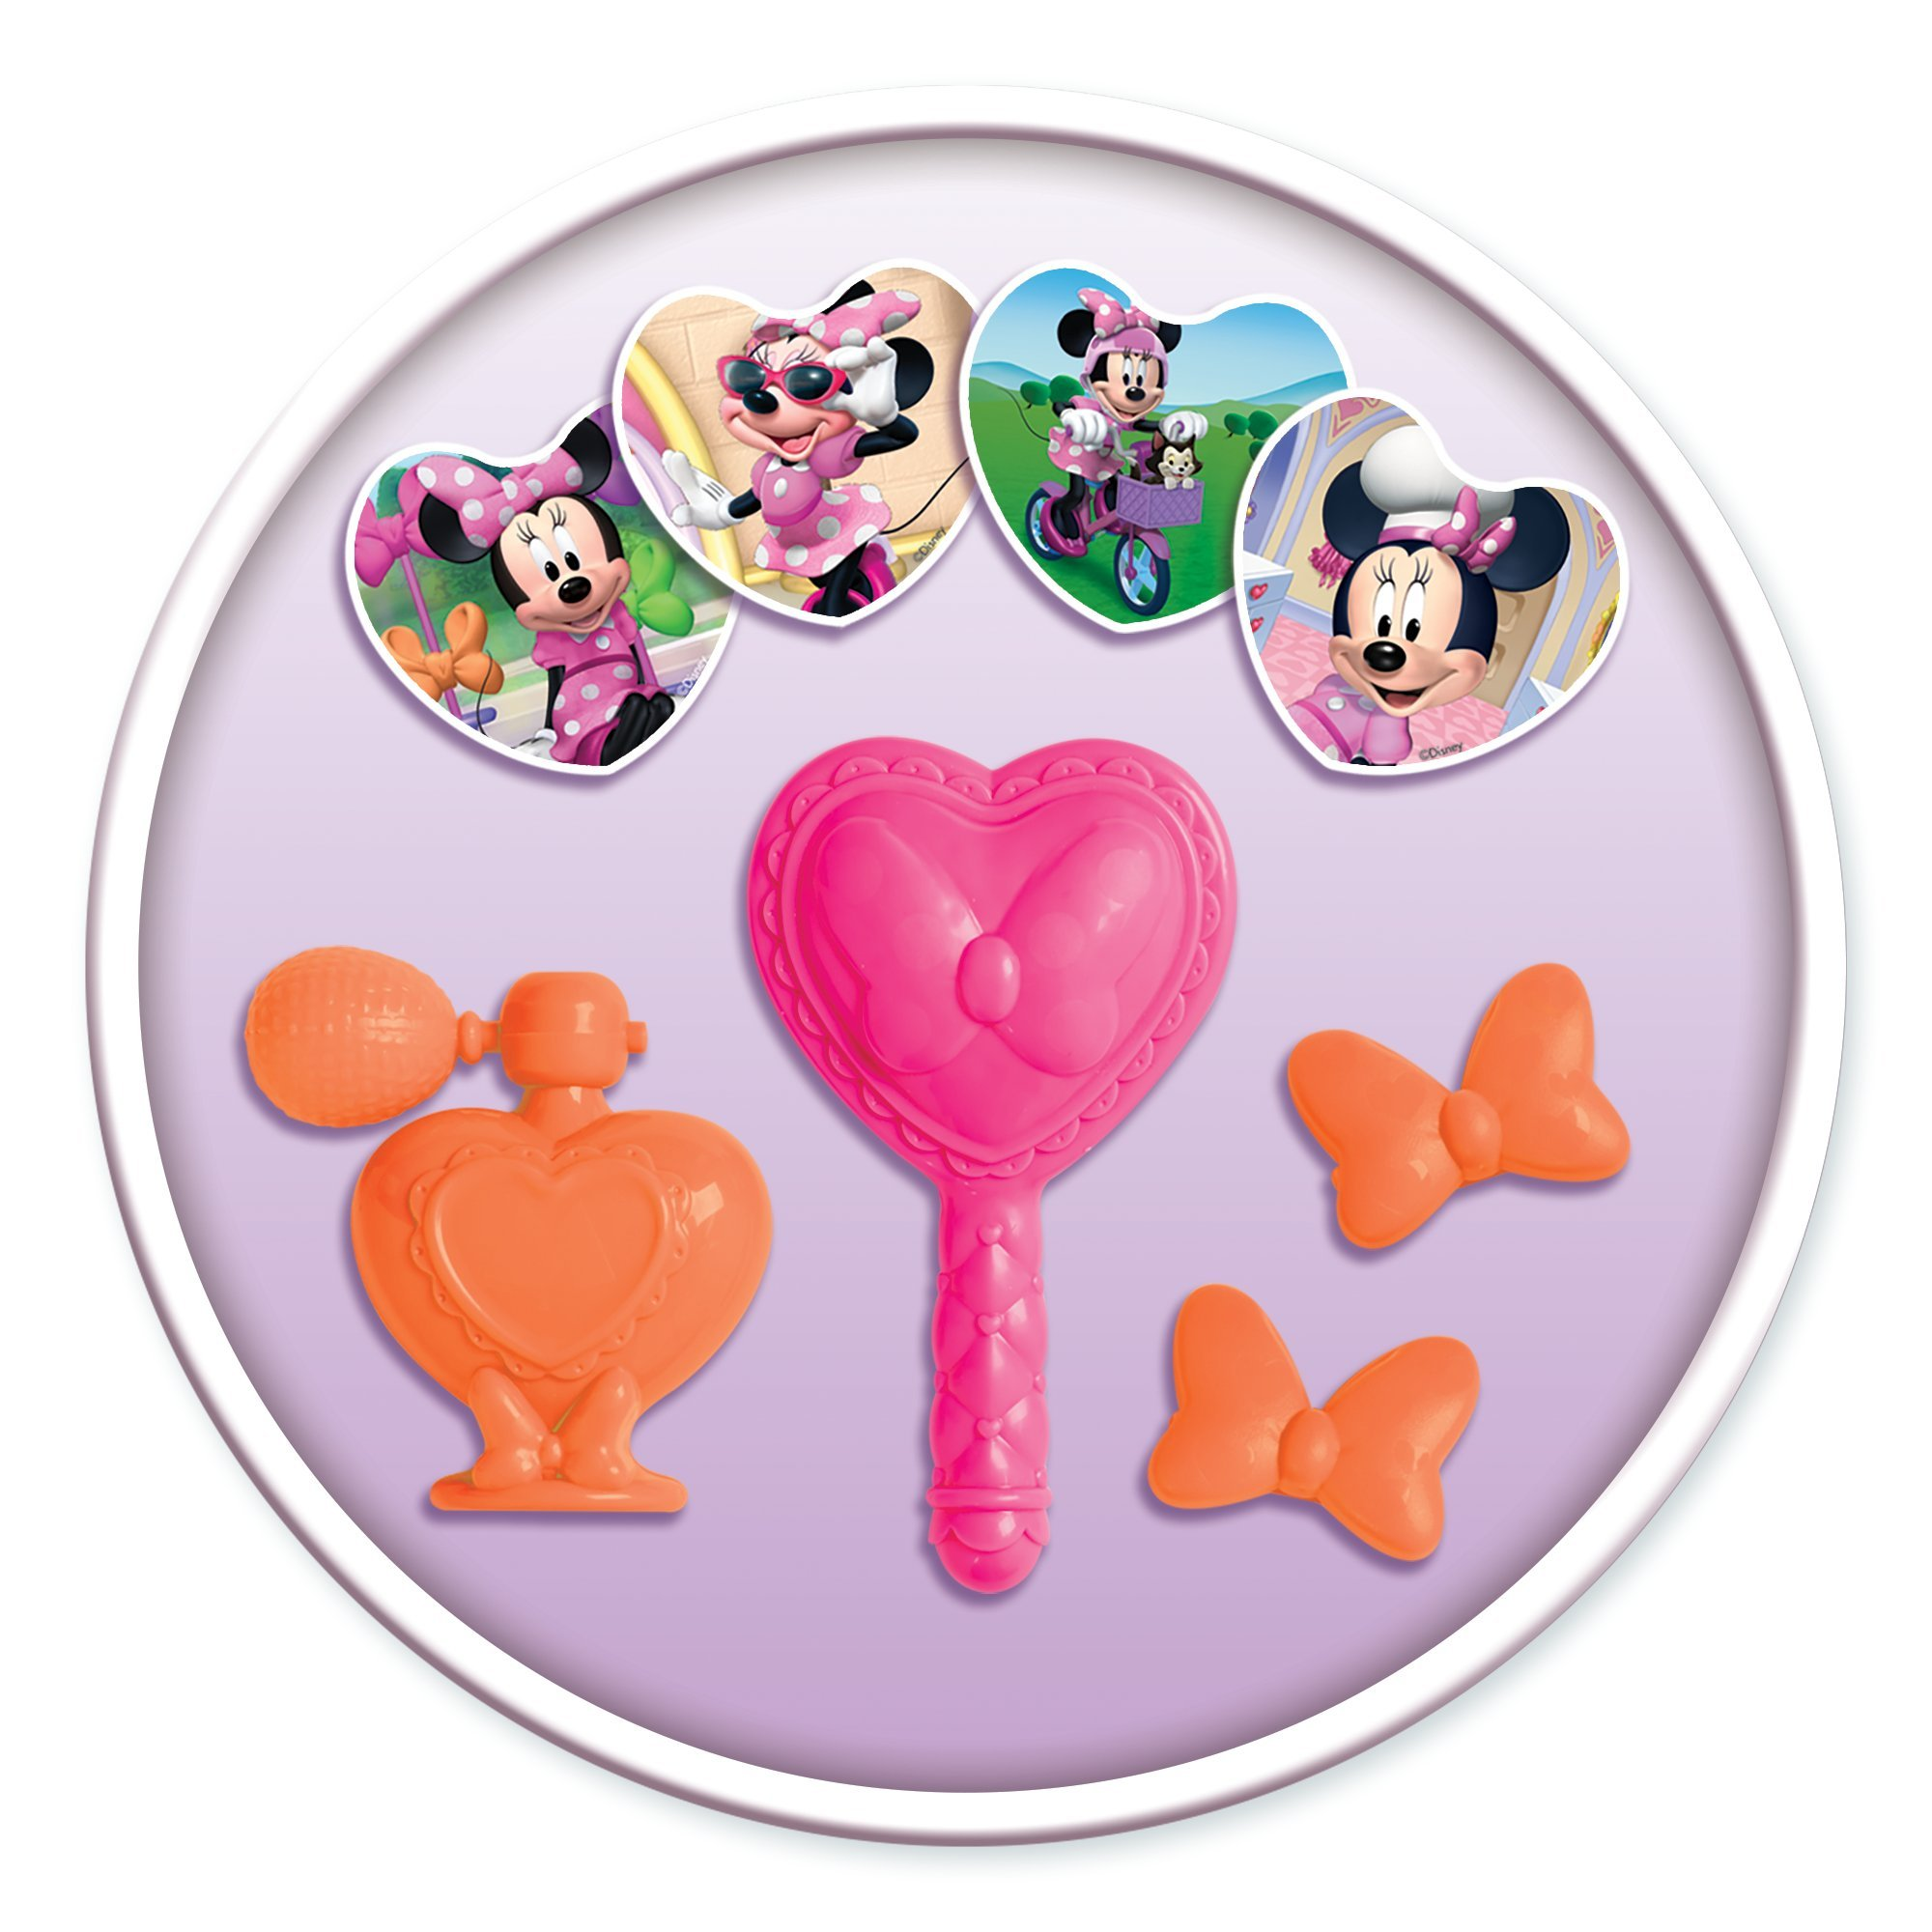 Disney Minnie Bow-Tique Bowdazzling Vanity